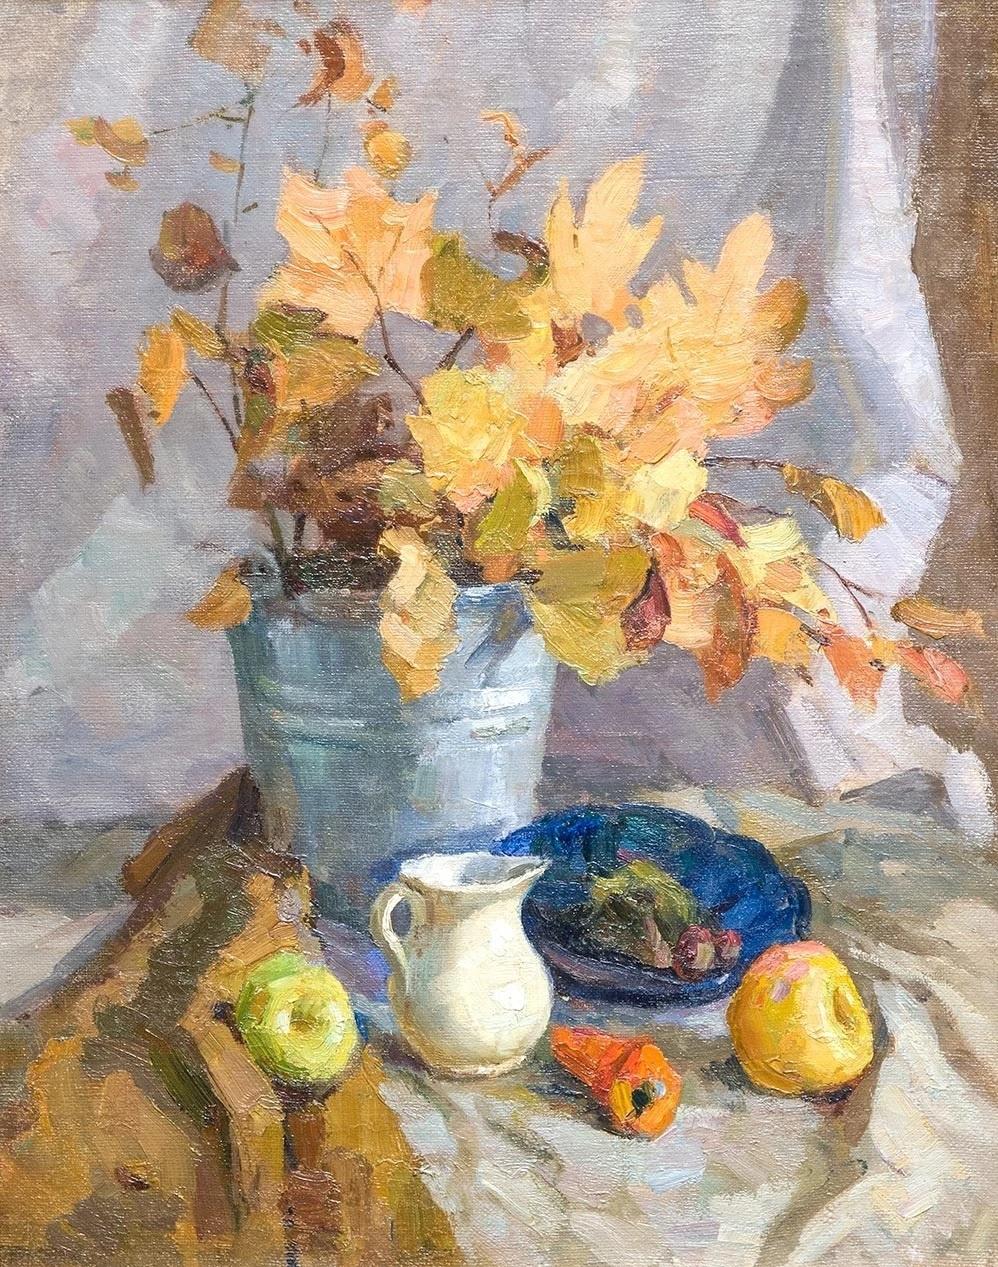 Sergey Vasilyevich Gerasimov. Autumn still life